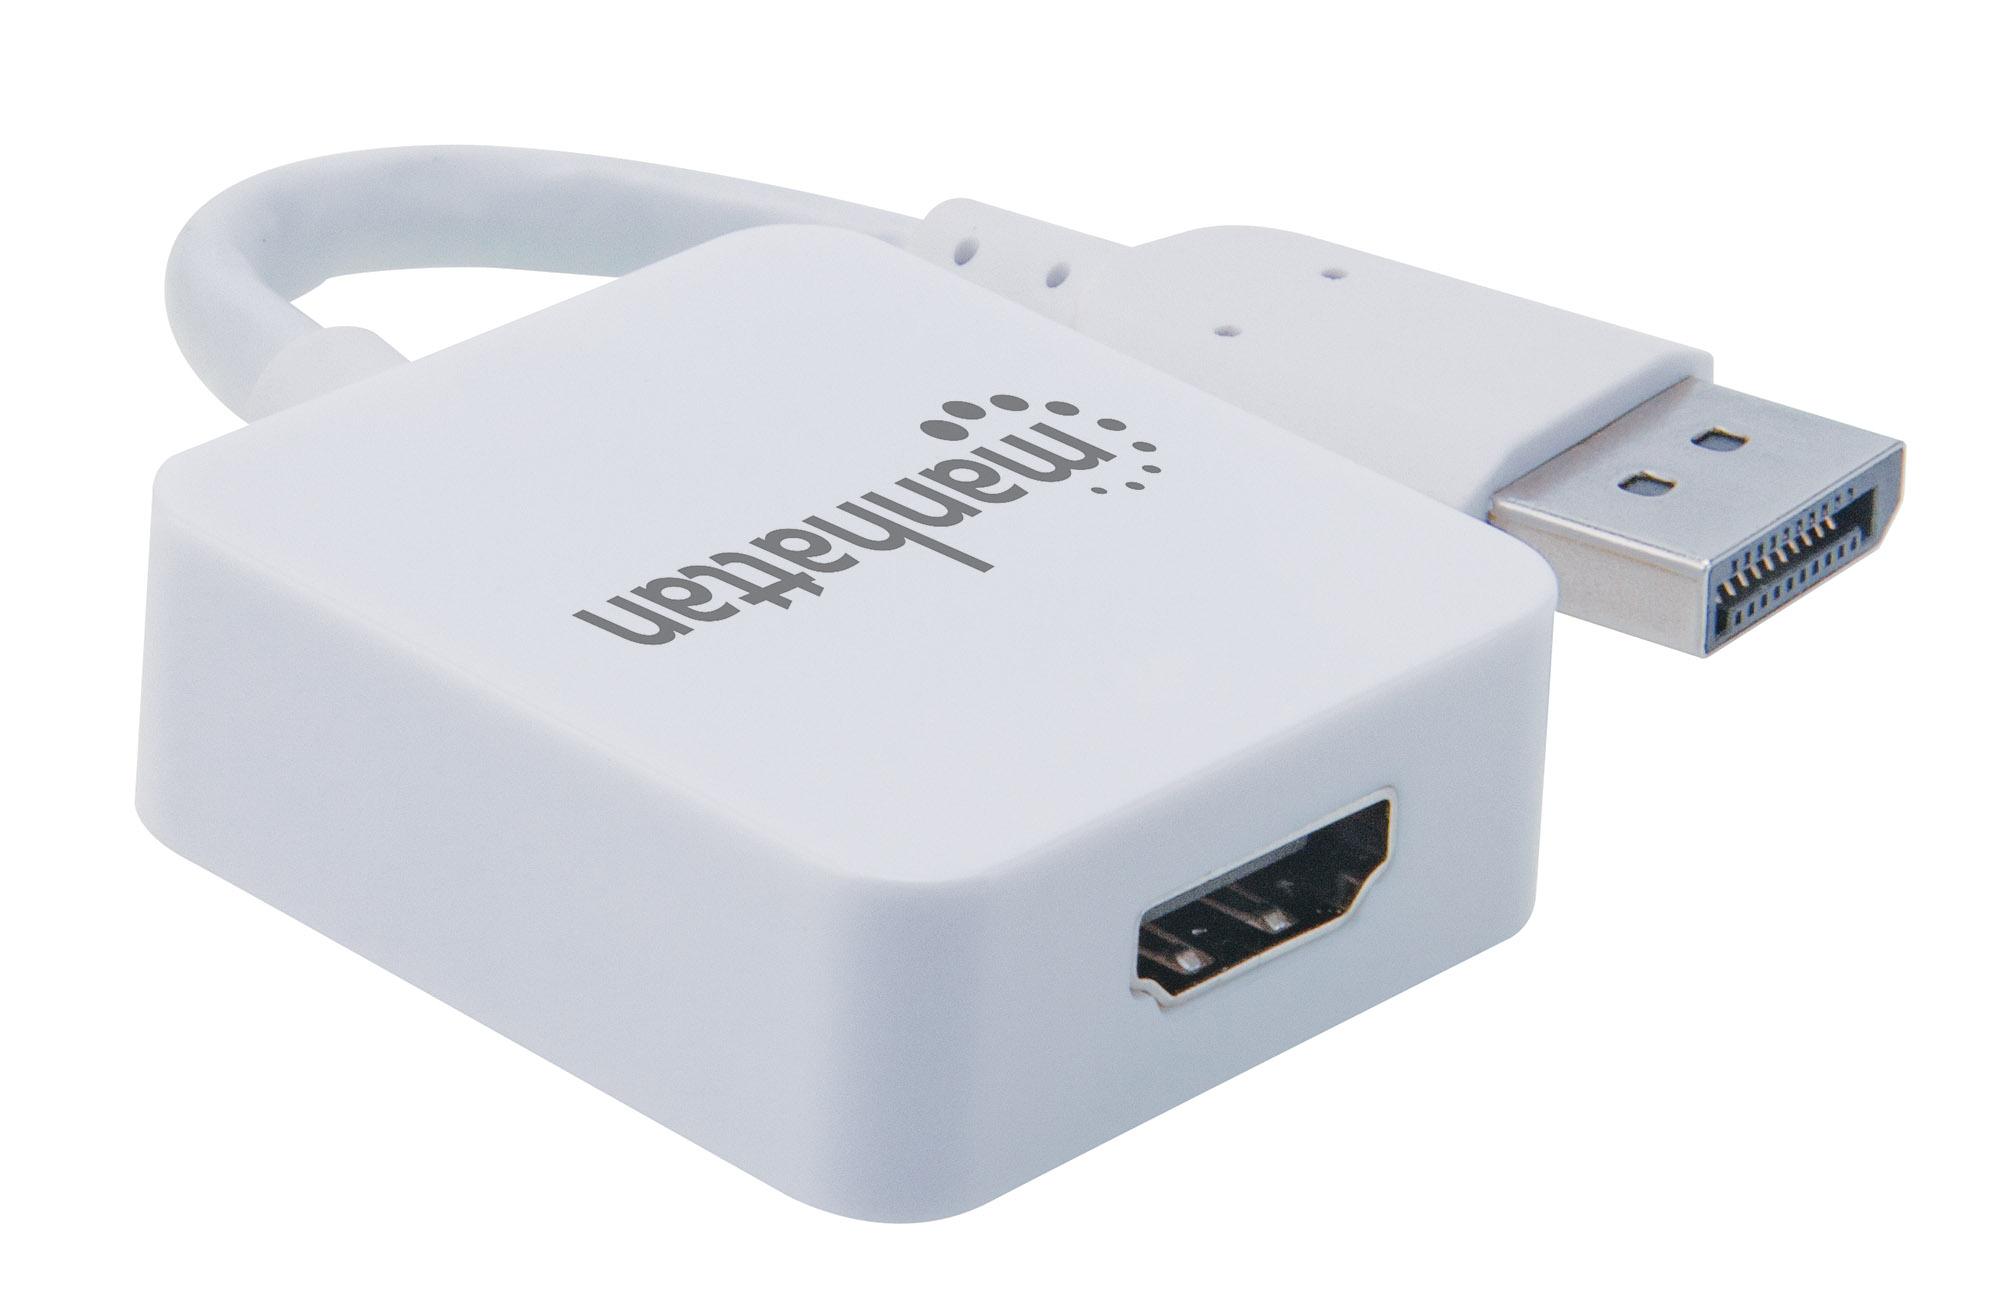 HDMI to DisplayPort Converter